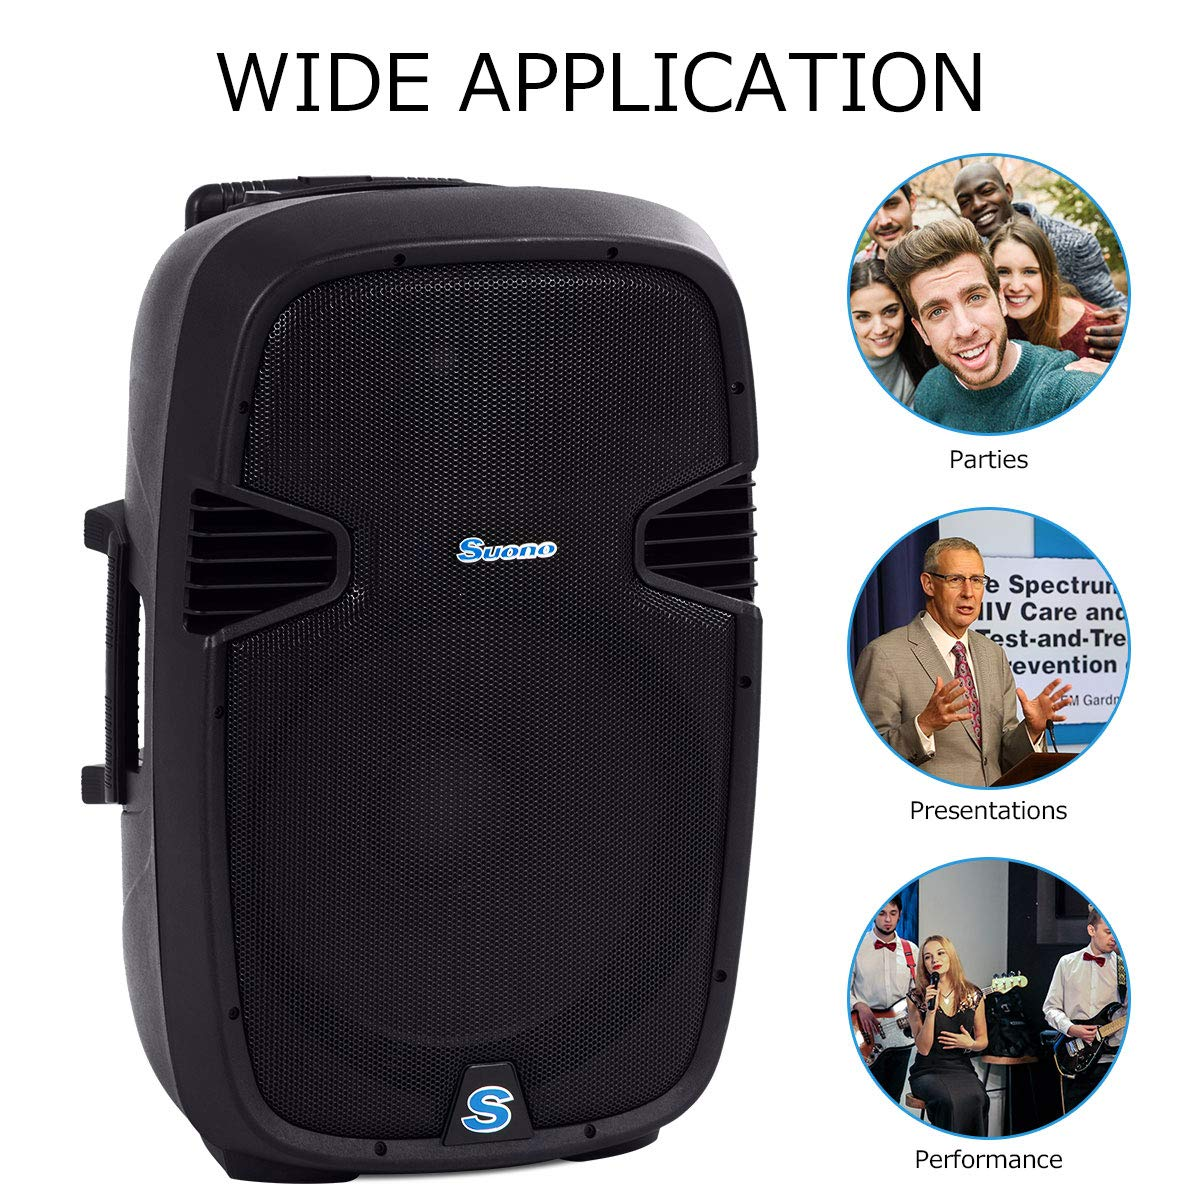 Suono Powered Speakers, 2-Way Full Range Portable DJ/PA Speaker System Set With Microphones/USB/Bluetooth (15'' 1000W) by Suono (Image #2)